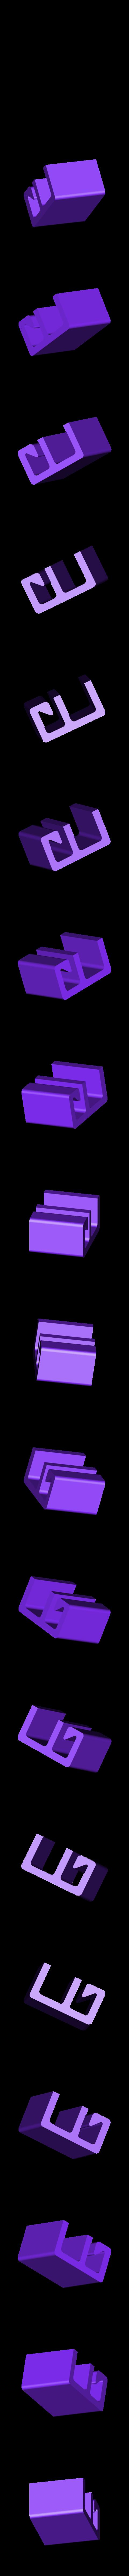 Part3x2.STL Download free STL file Recipe book / iPad / tablet holder • Design to 3D print, poorveshmistry